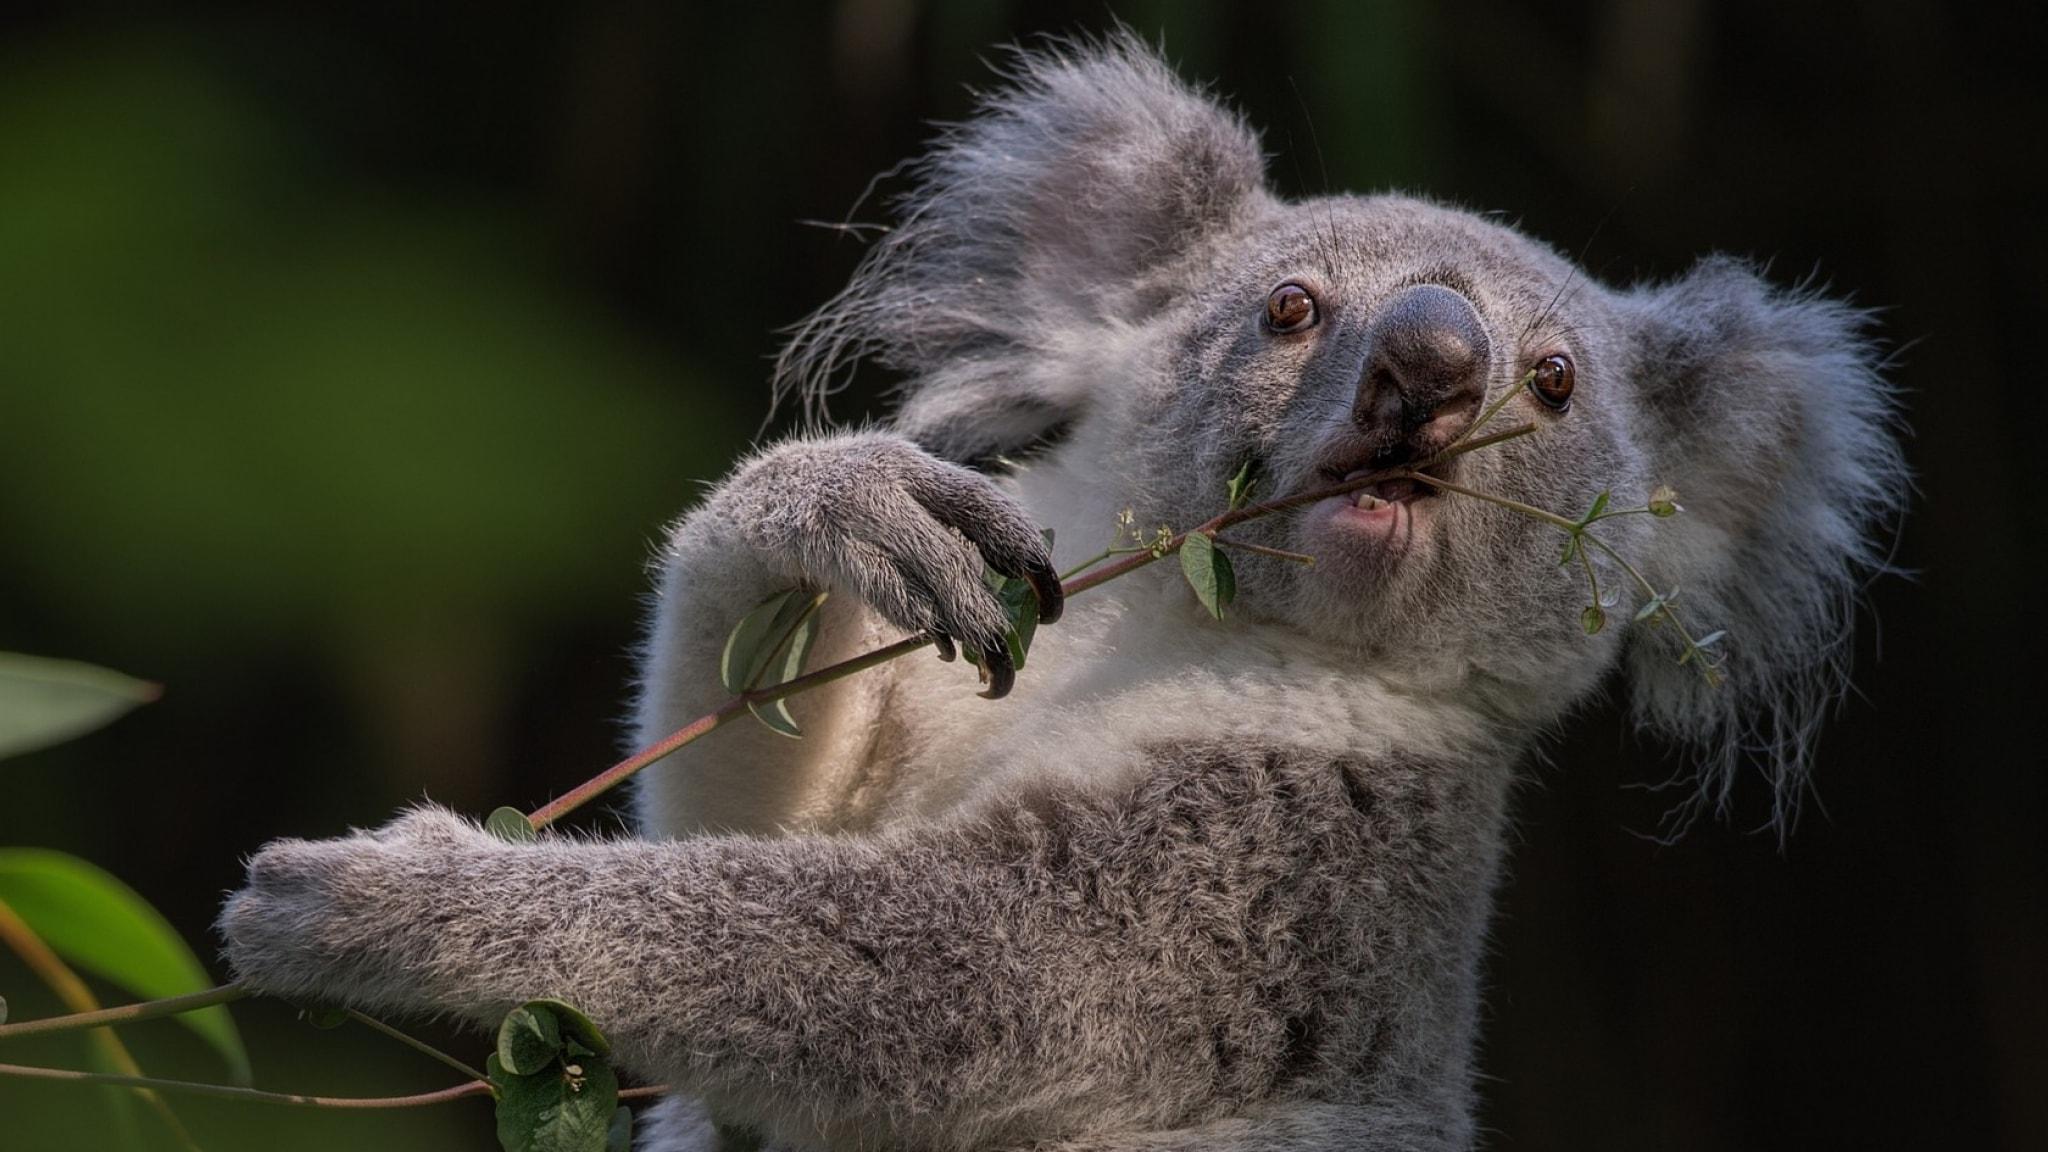 Koala Widescreen